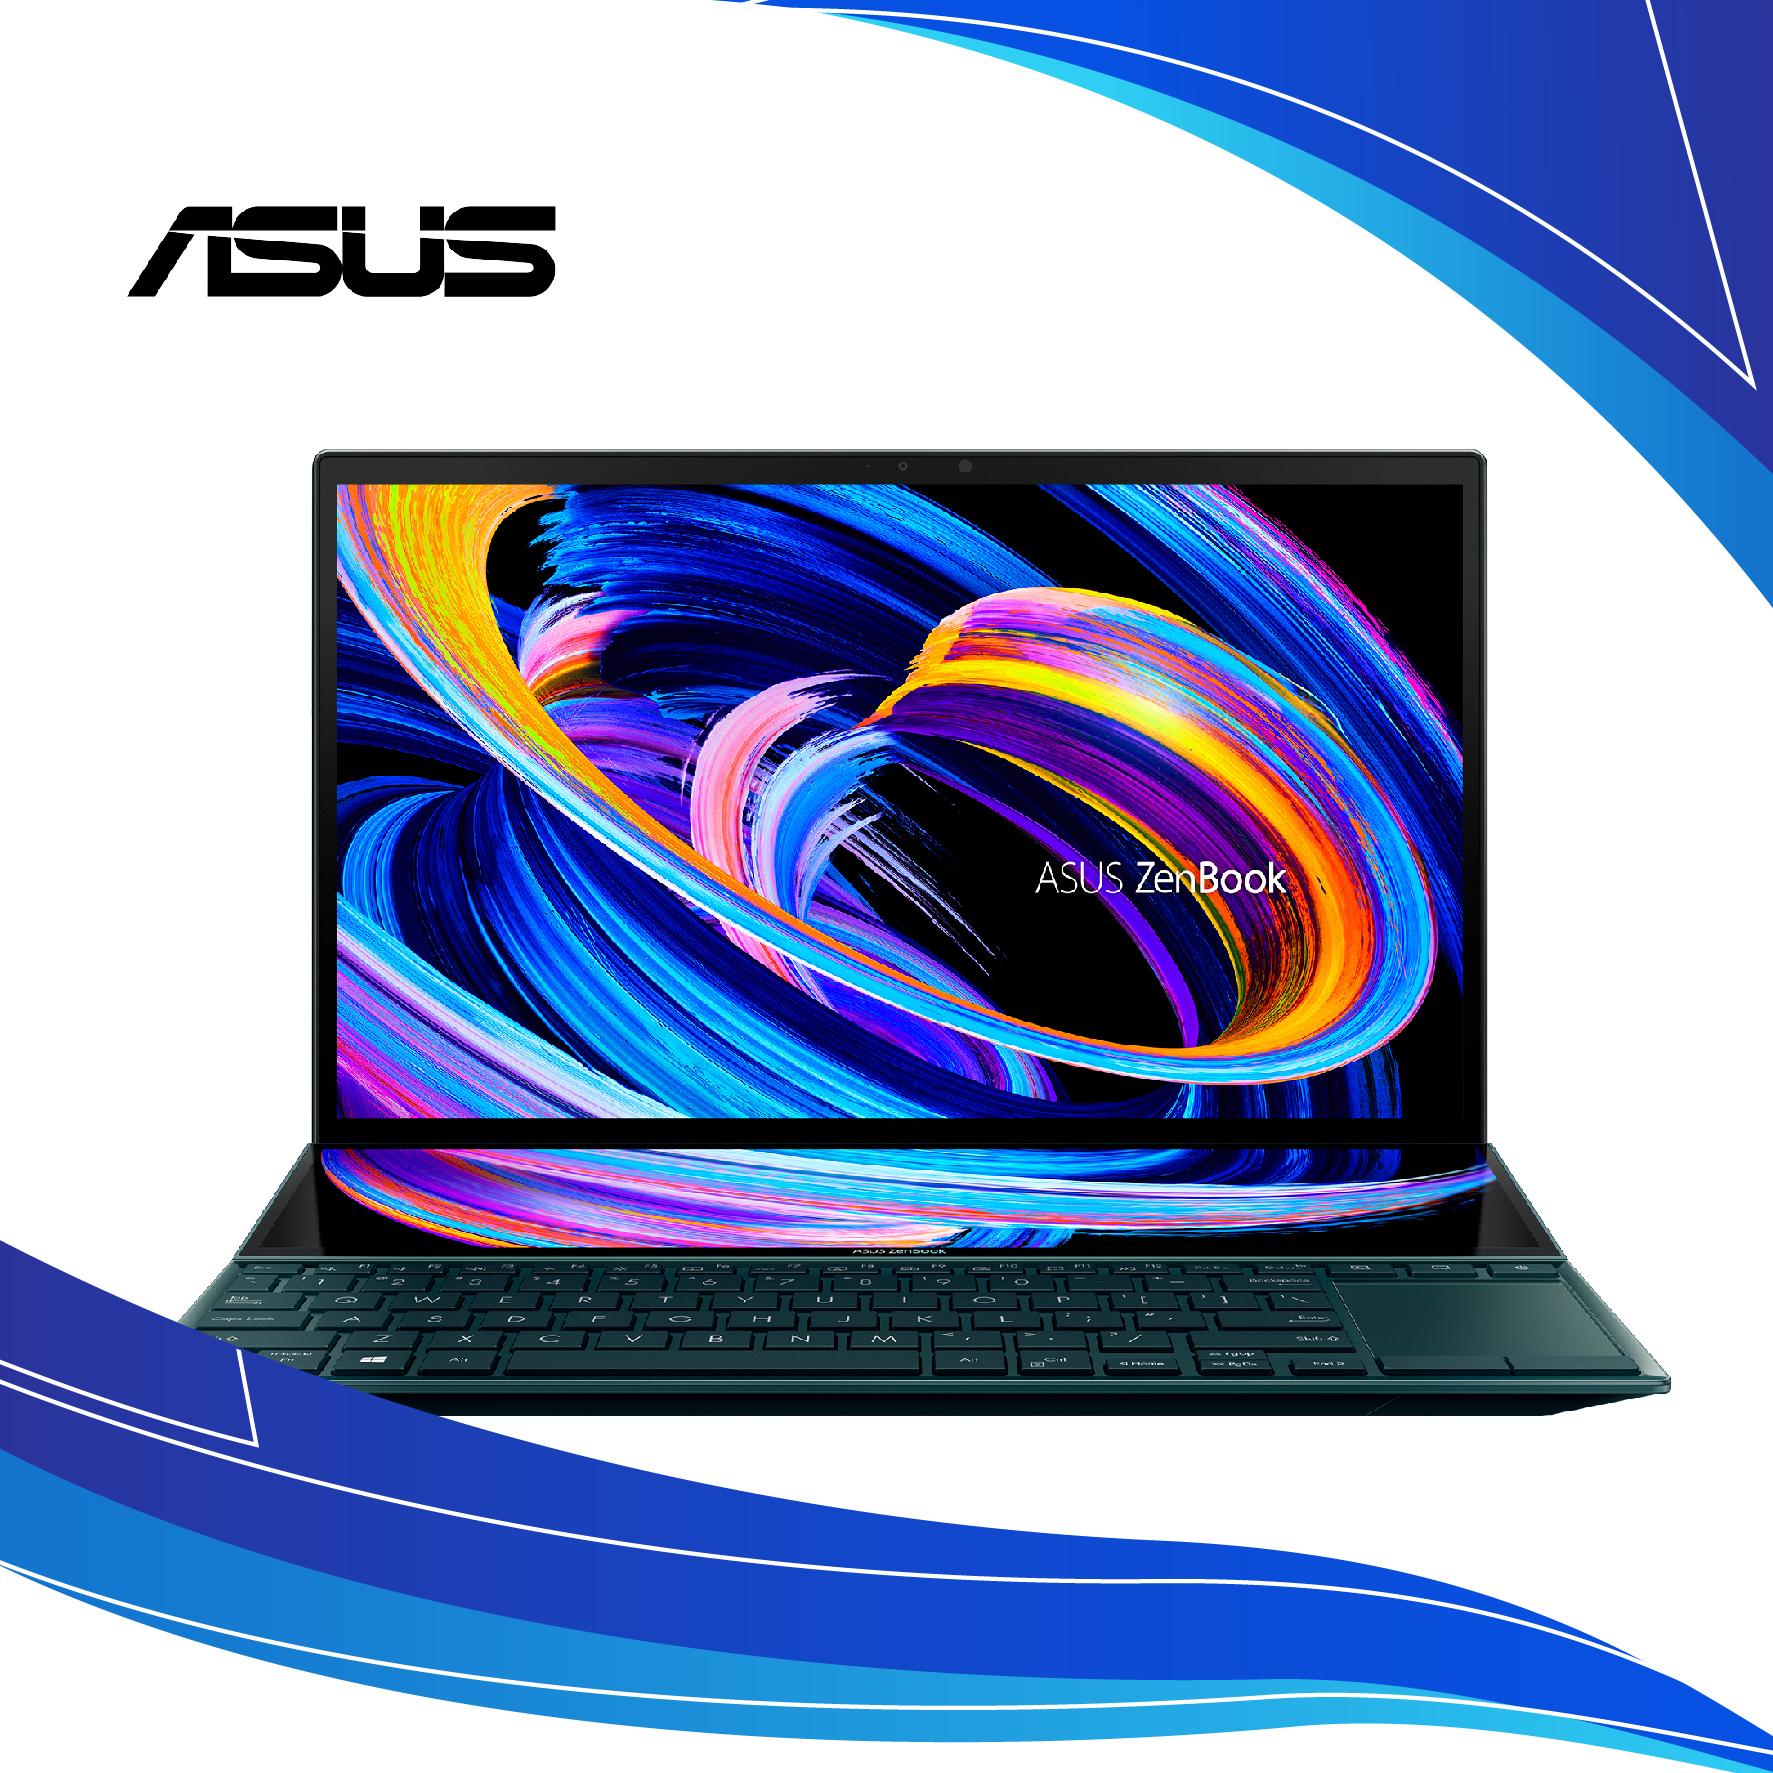 Portátil ASUS ZenBook Duo 14 UX482   Asus portatiles al costo   ASUS ZENBOOK 14